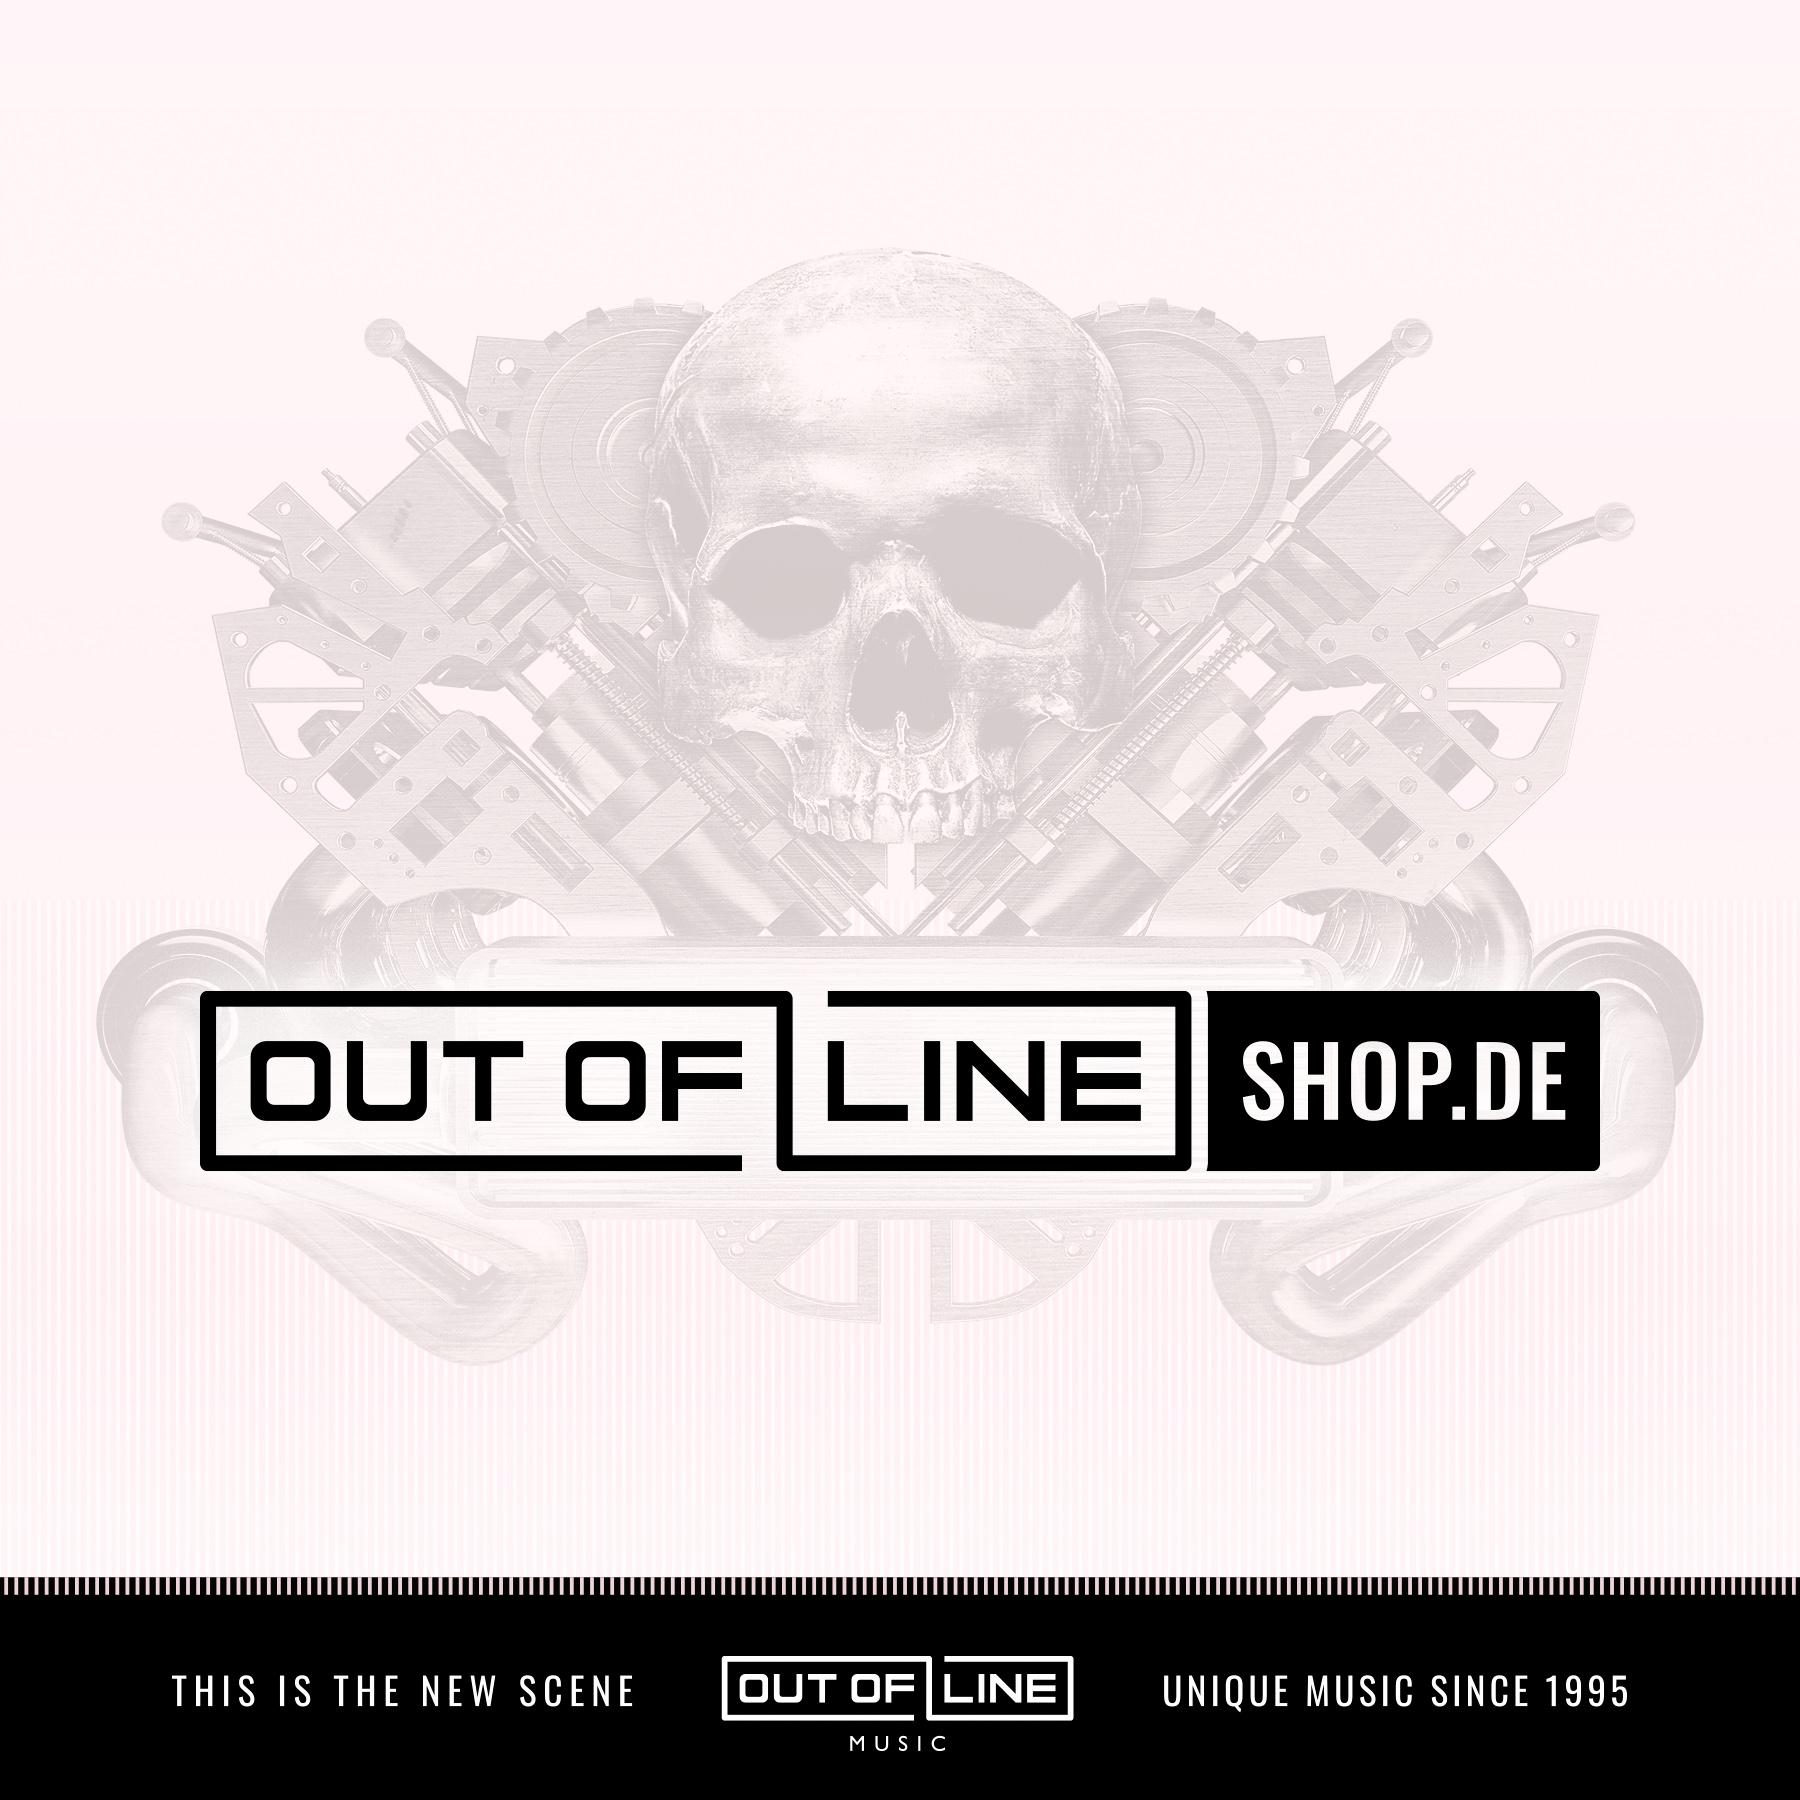 Rummelsnuff & Asbach - Äquatortaufe - CD/T-Shirt - Bundle